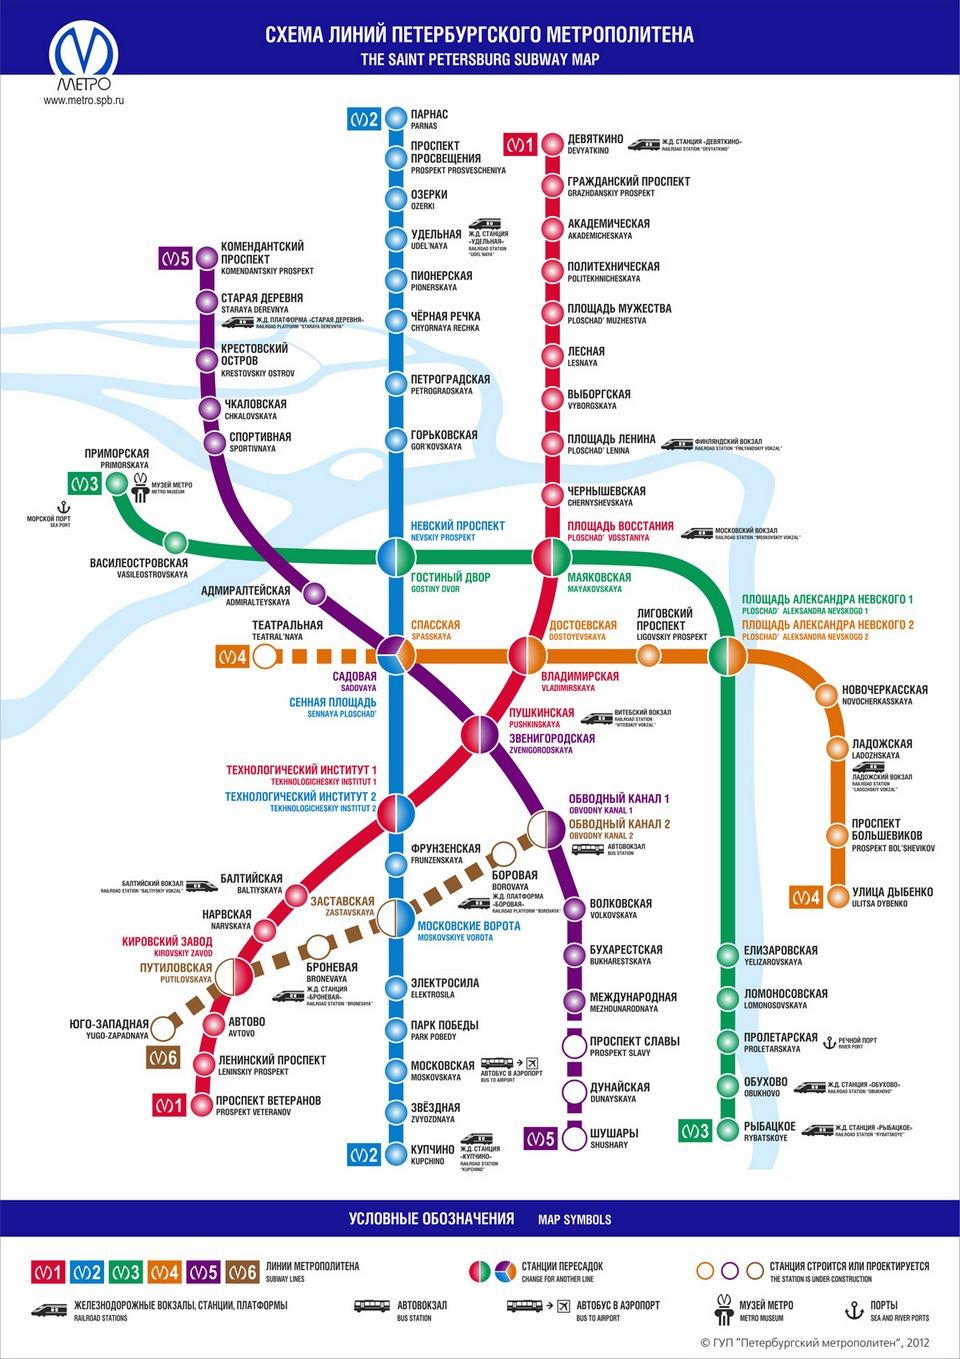 Карта метро / Расписание метро Санкт-Петербурга